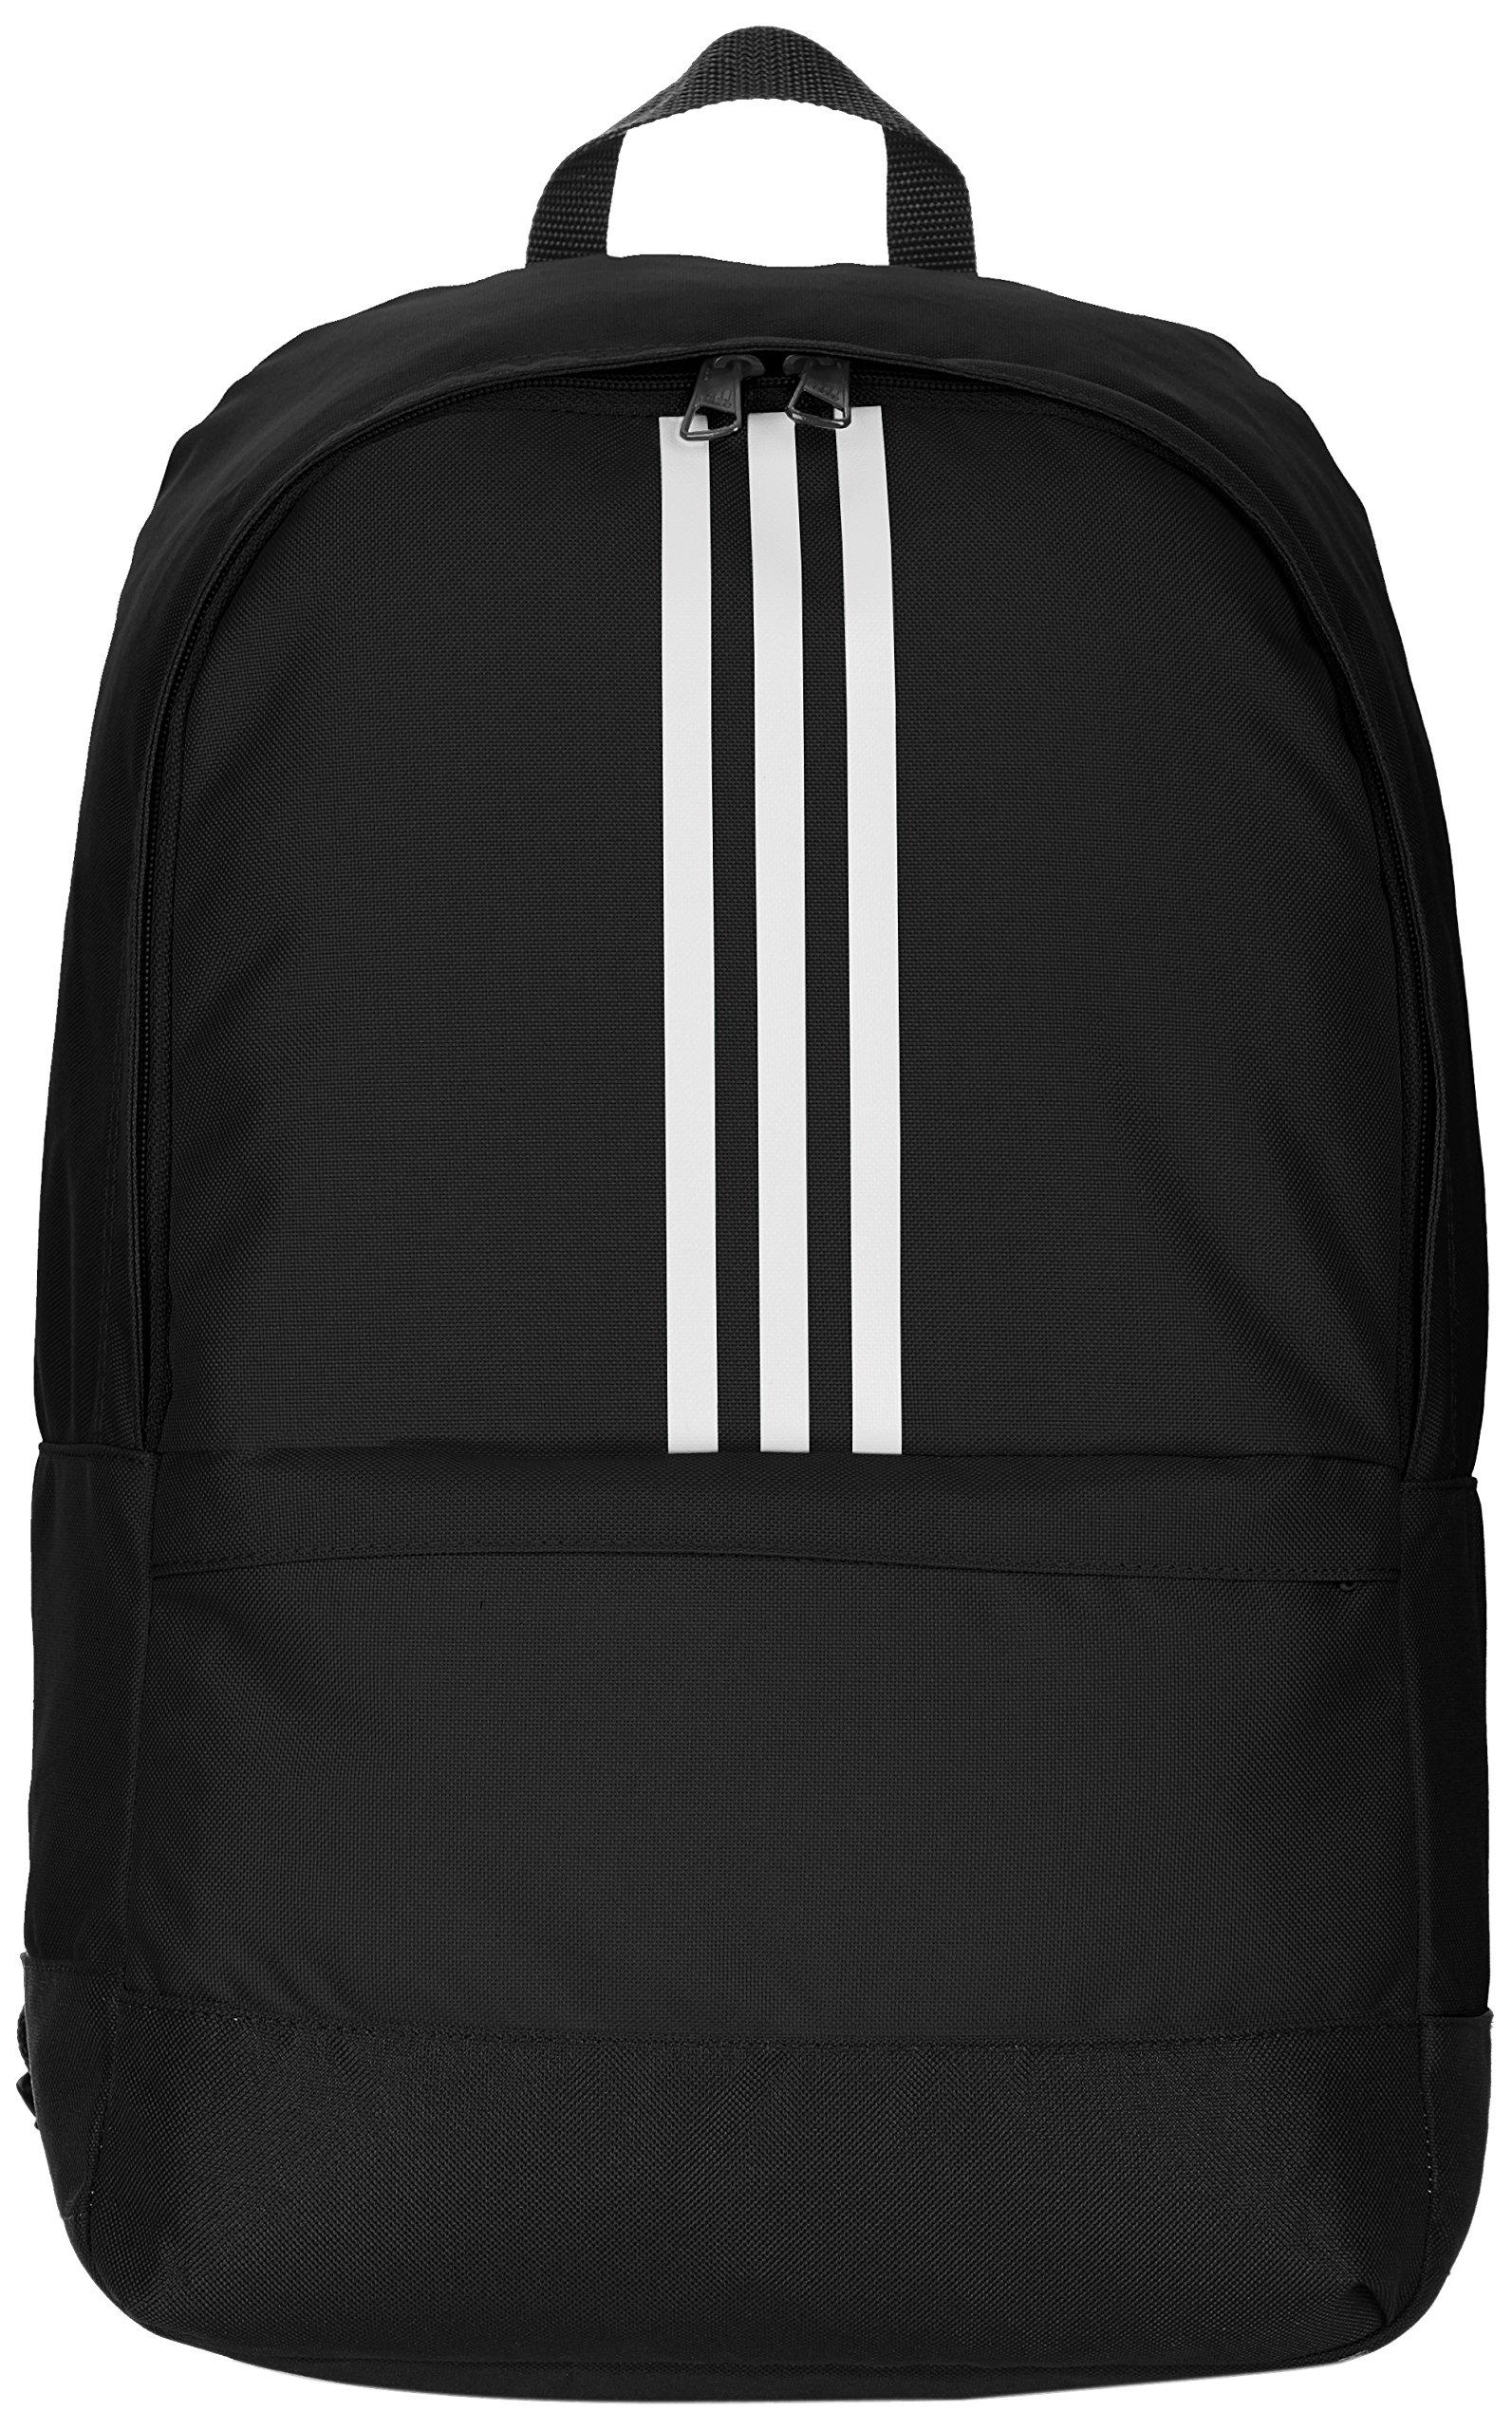 AdidasSac Dos À Loisirs Homme NoirBlanc XN0OkwZ8nP